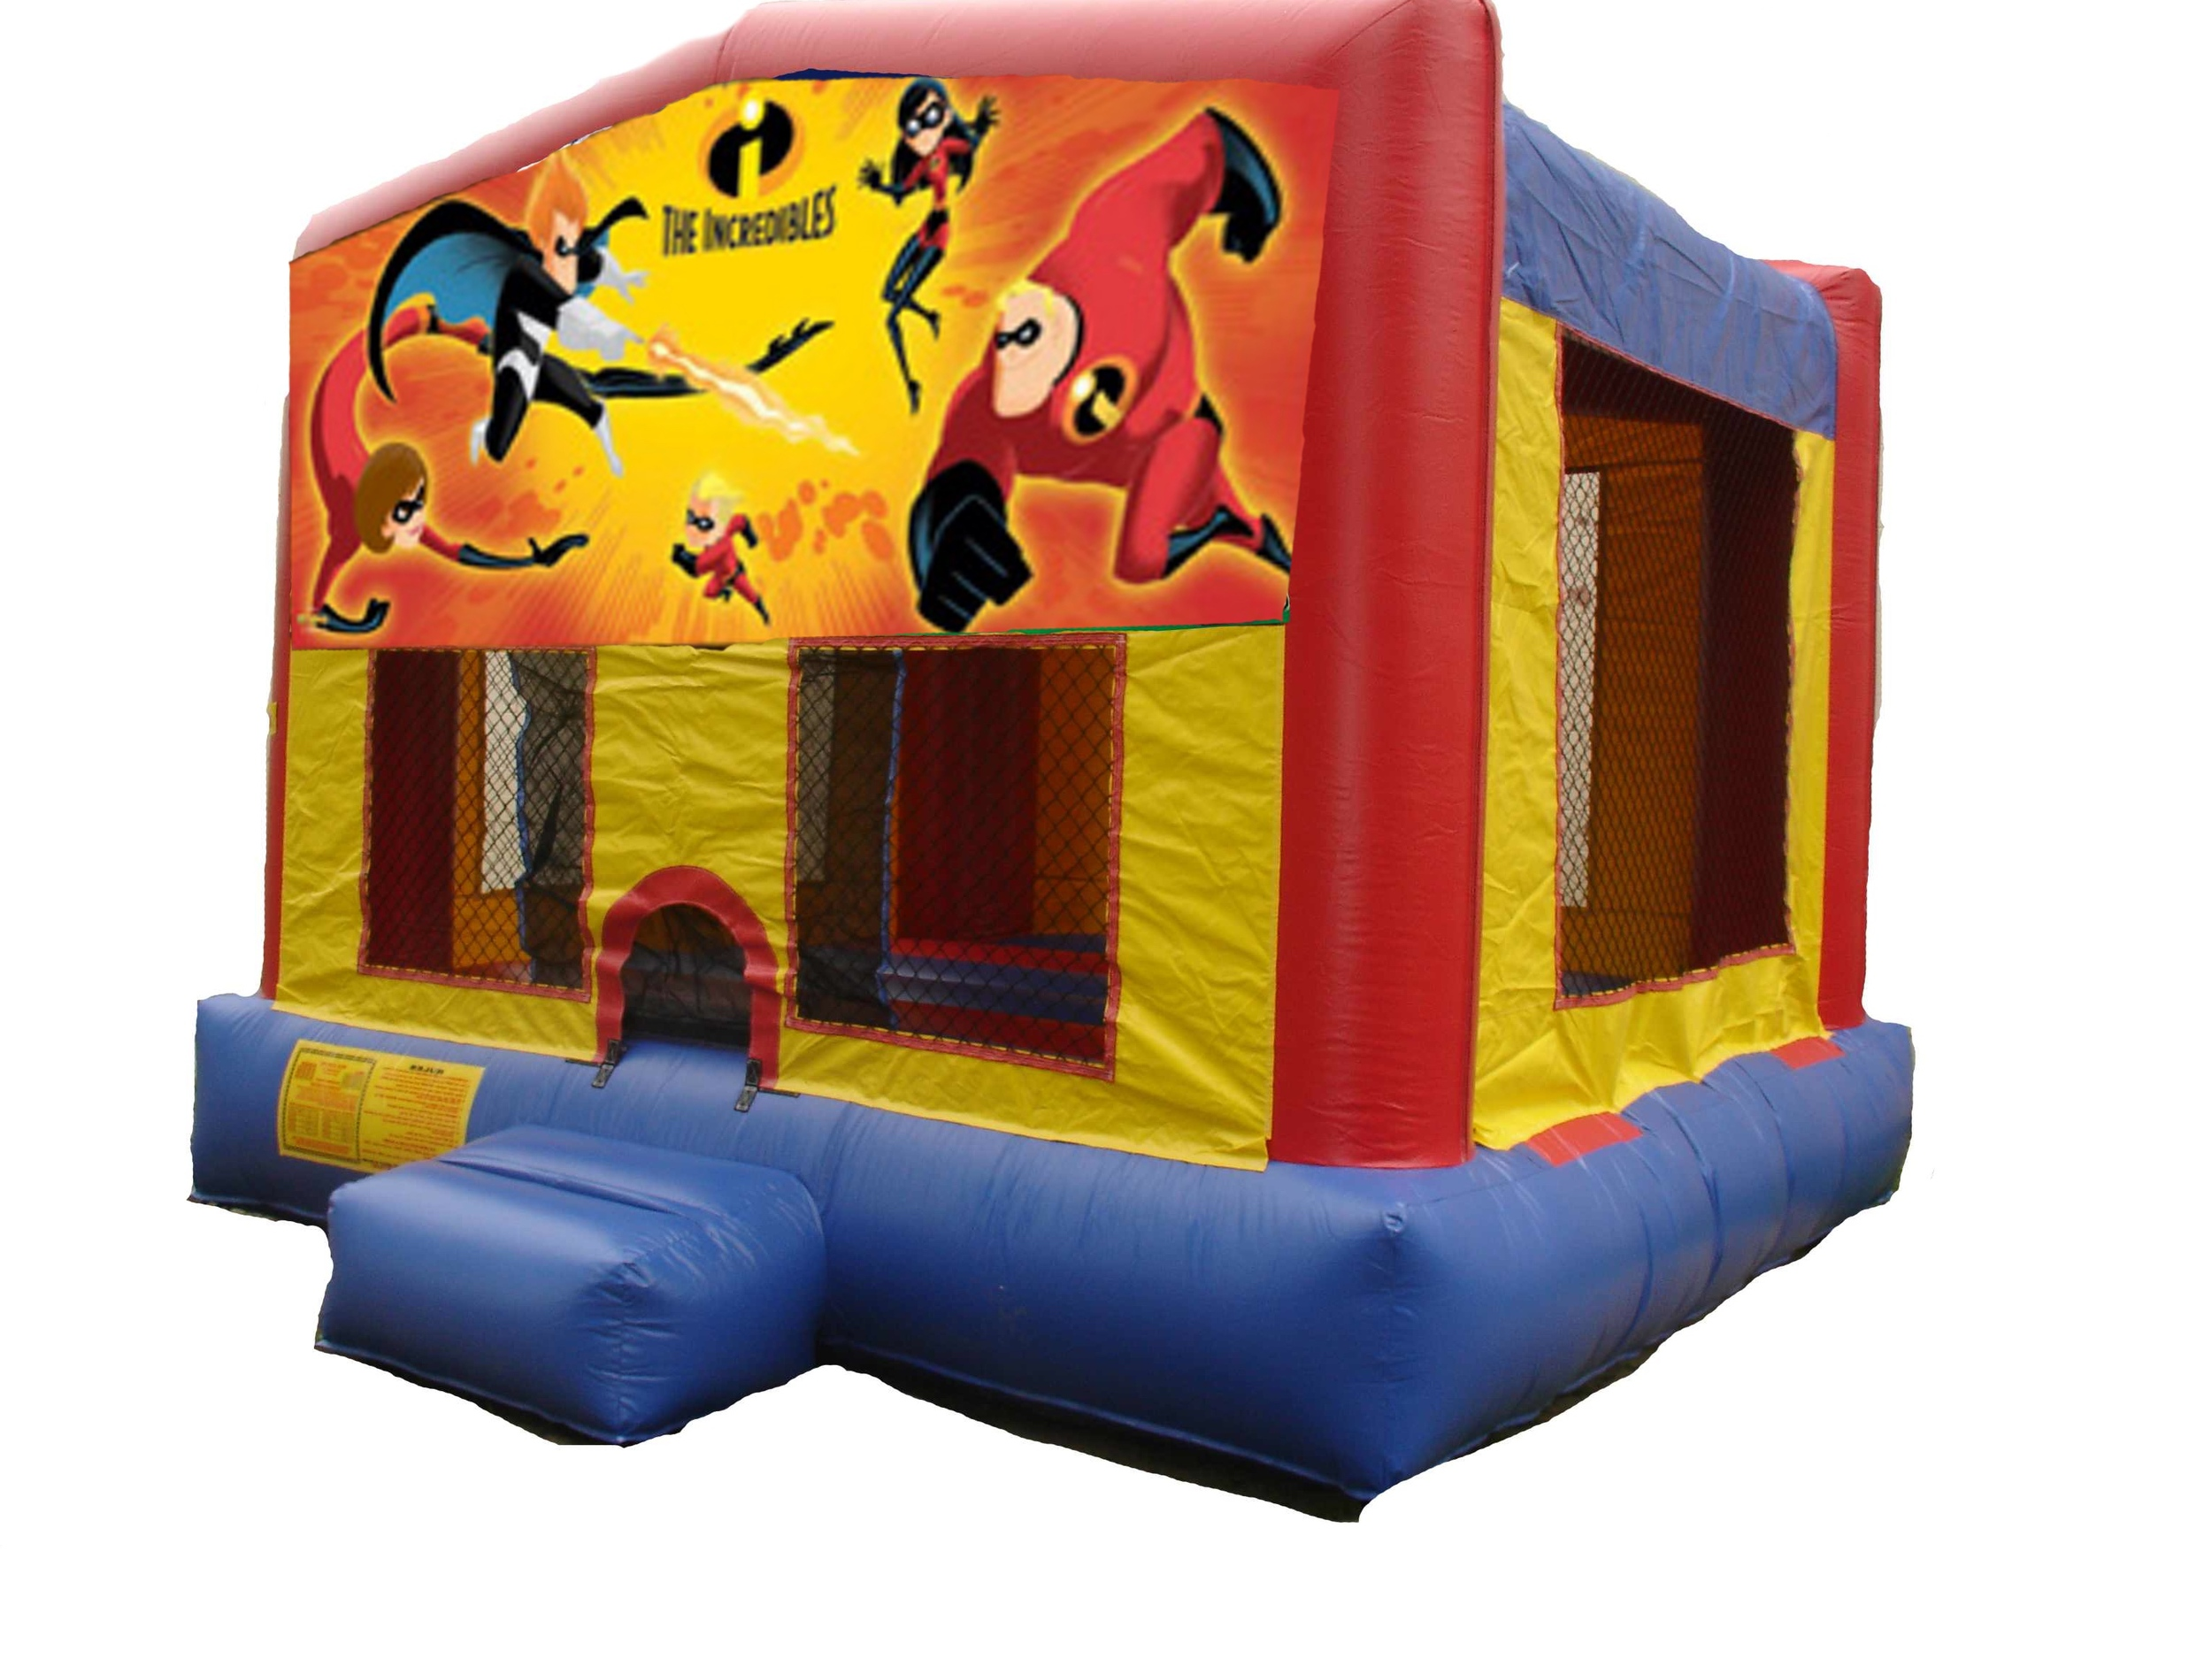 Incredibles Bouncer